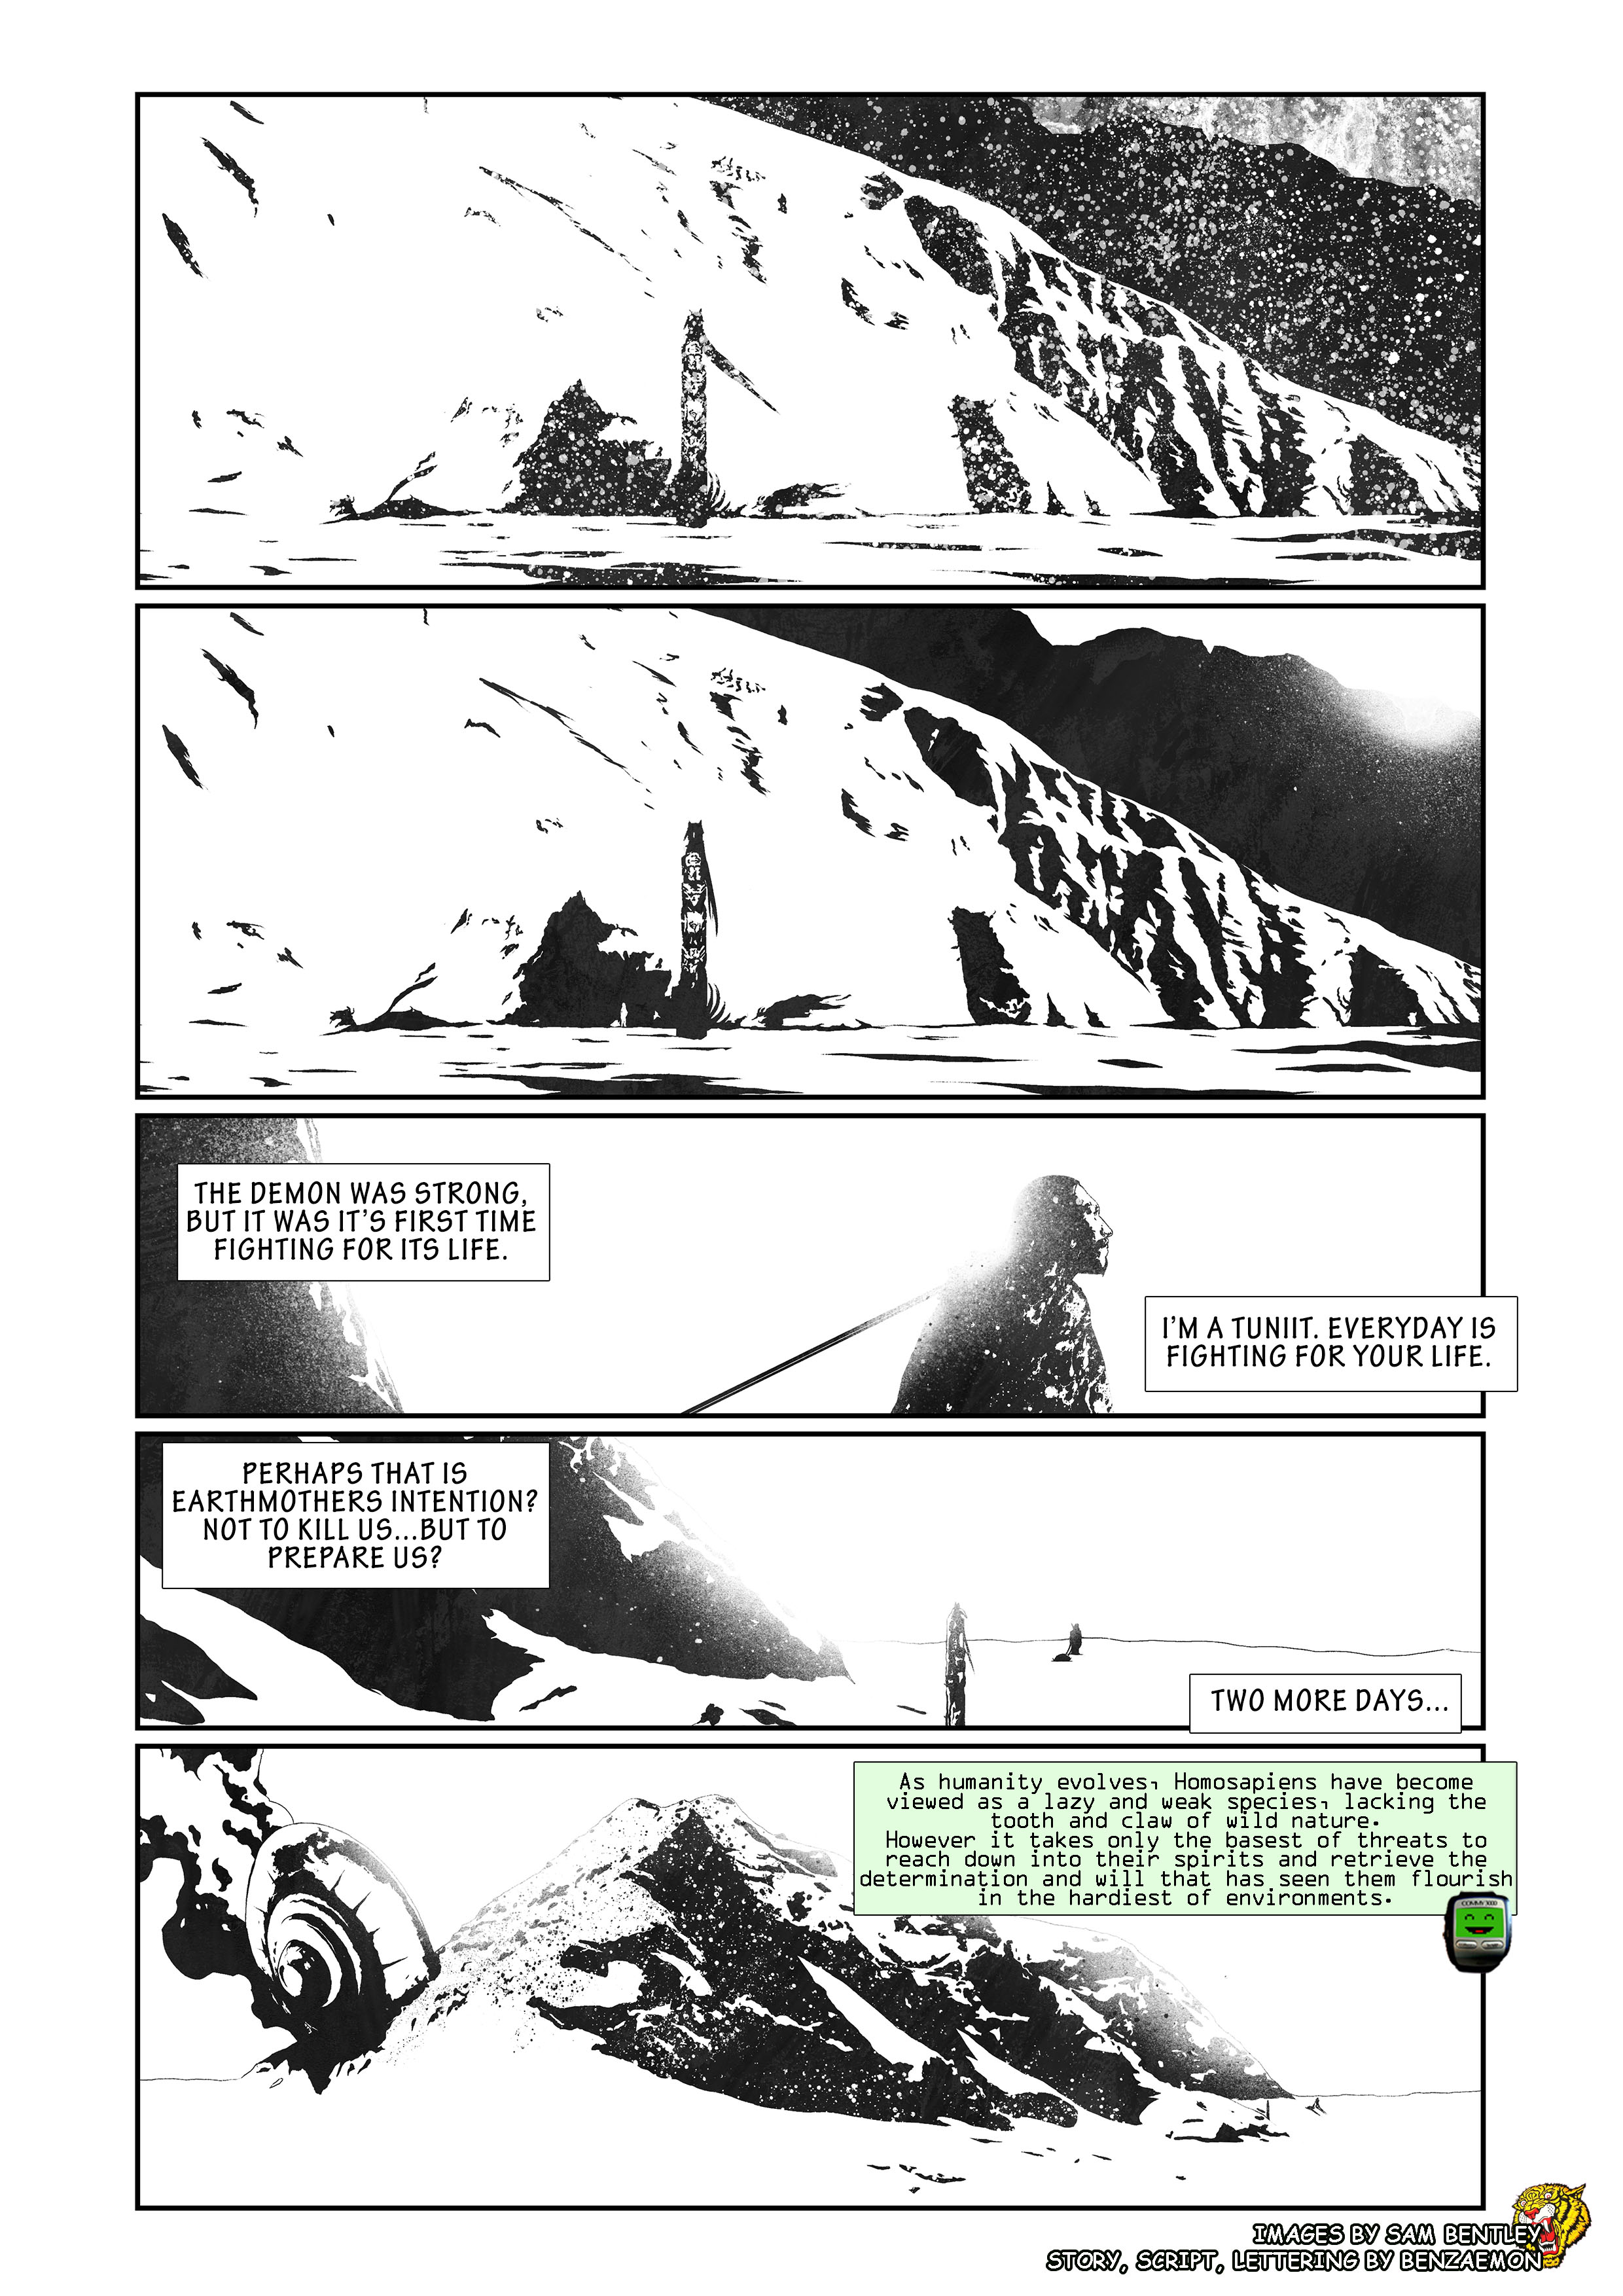 AMAQJUAQ FOR PRINT PAGE 04